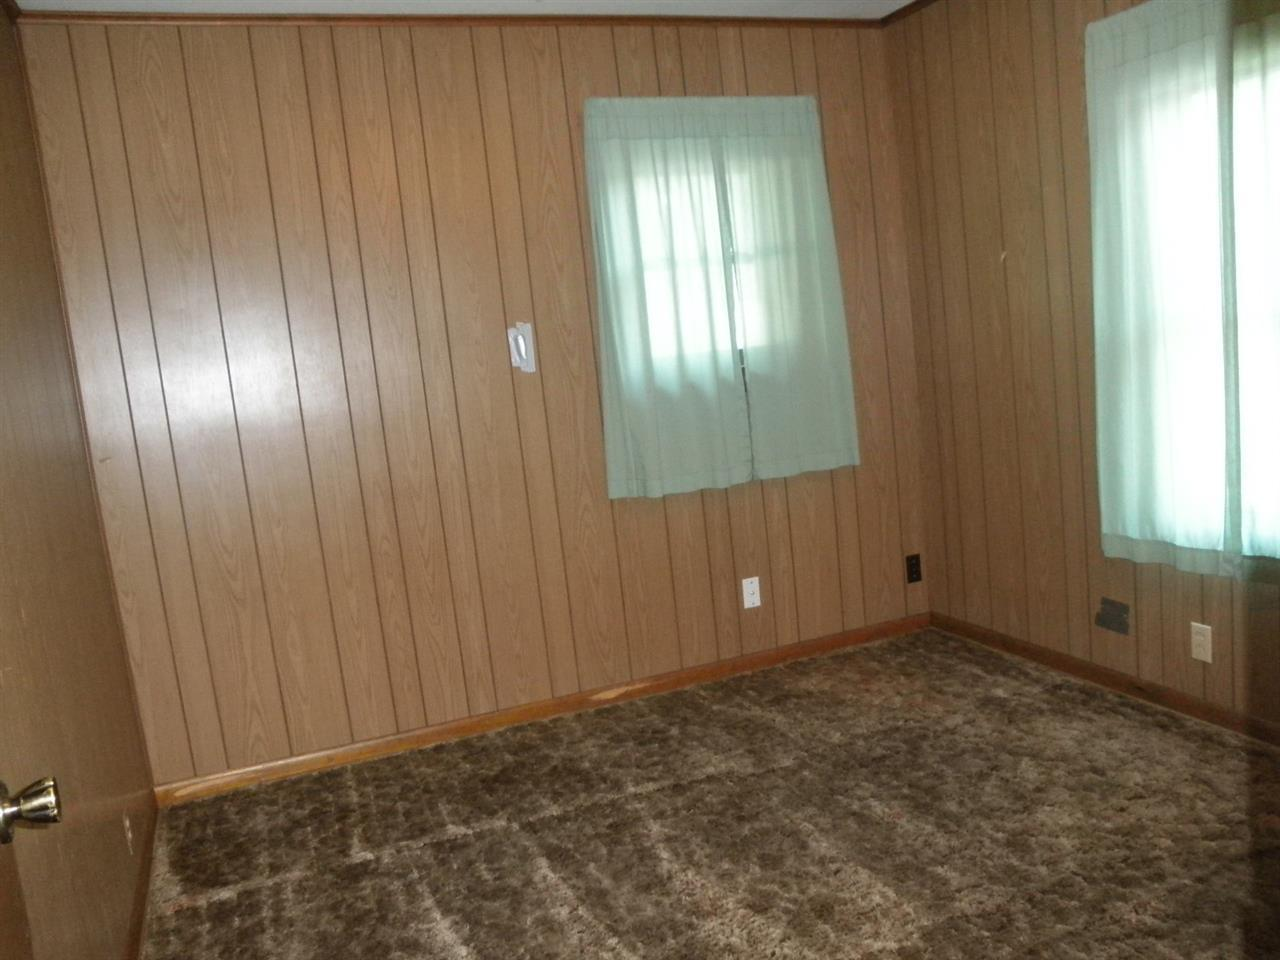 Sold Cross Sale W/ MLS | 916 E Cherry Ponca City, OK 74601 12